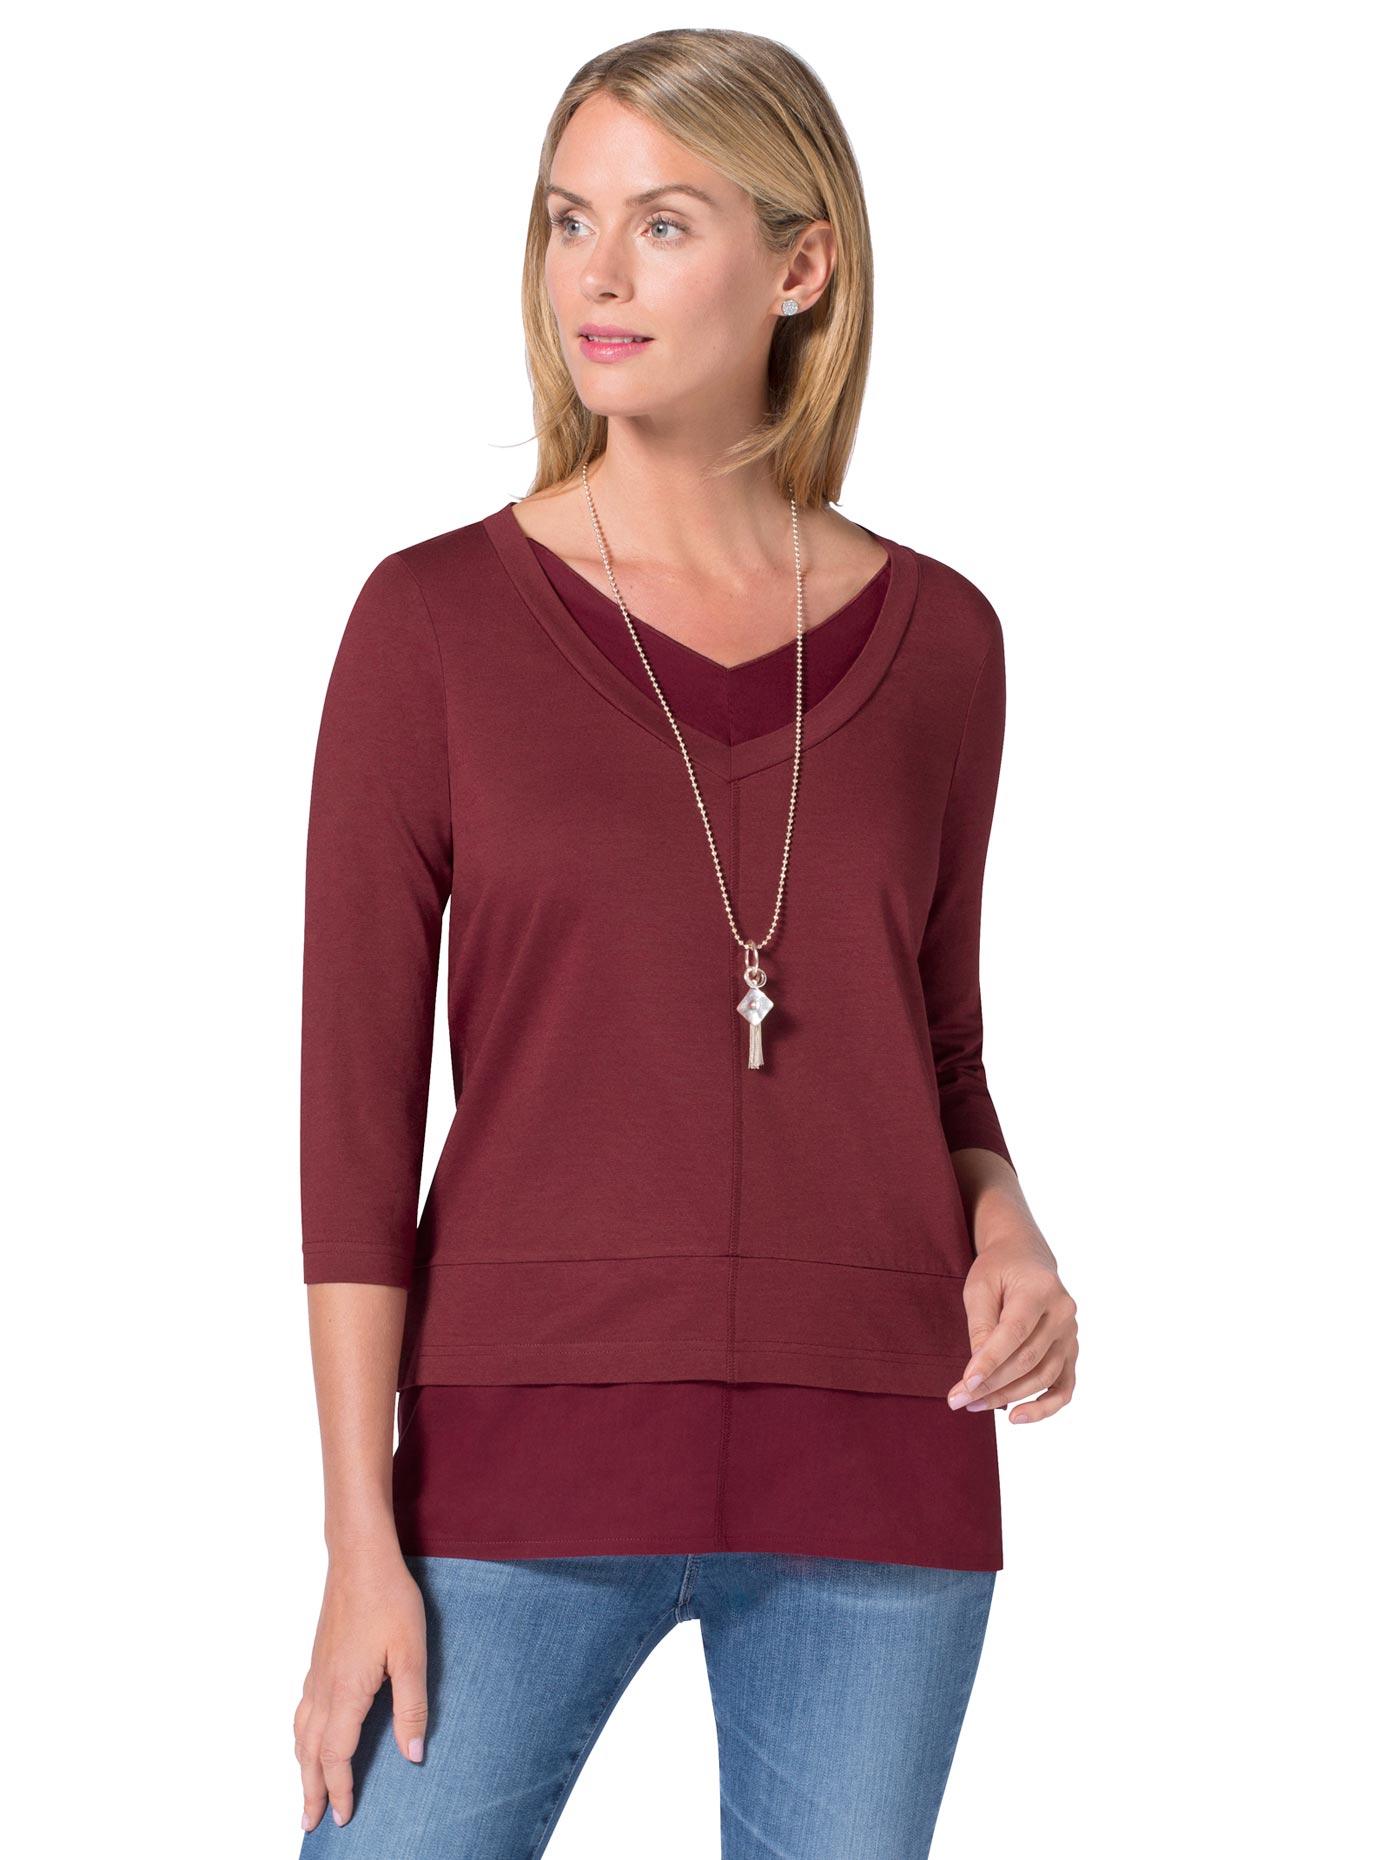 Ambria Longshirt in 2-in-1-Optik   Bekleidung > Shirts > Longshirts   Ambria